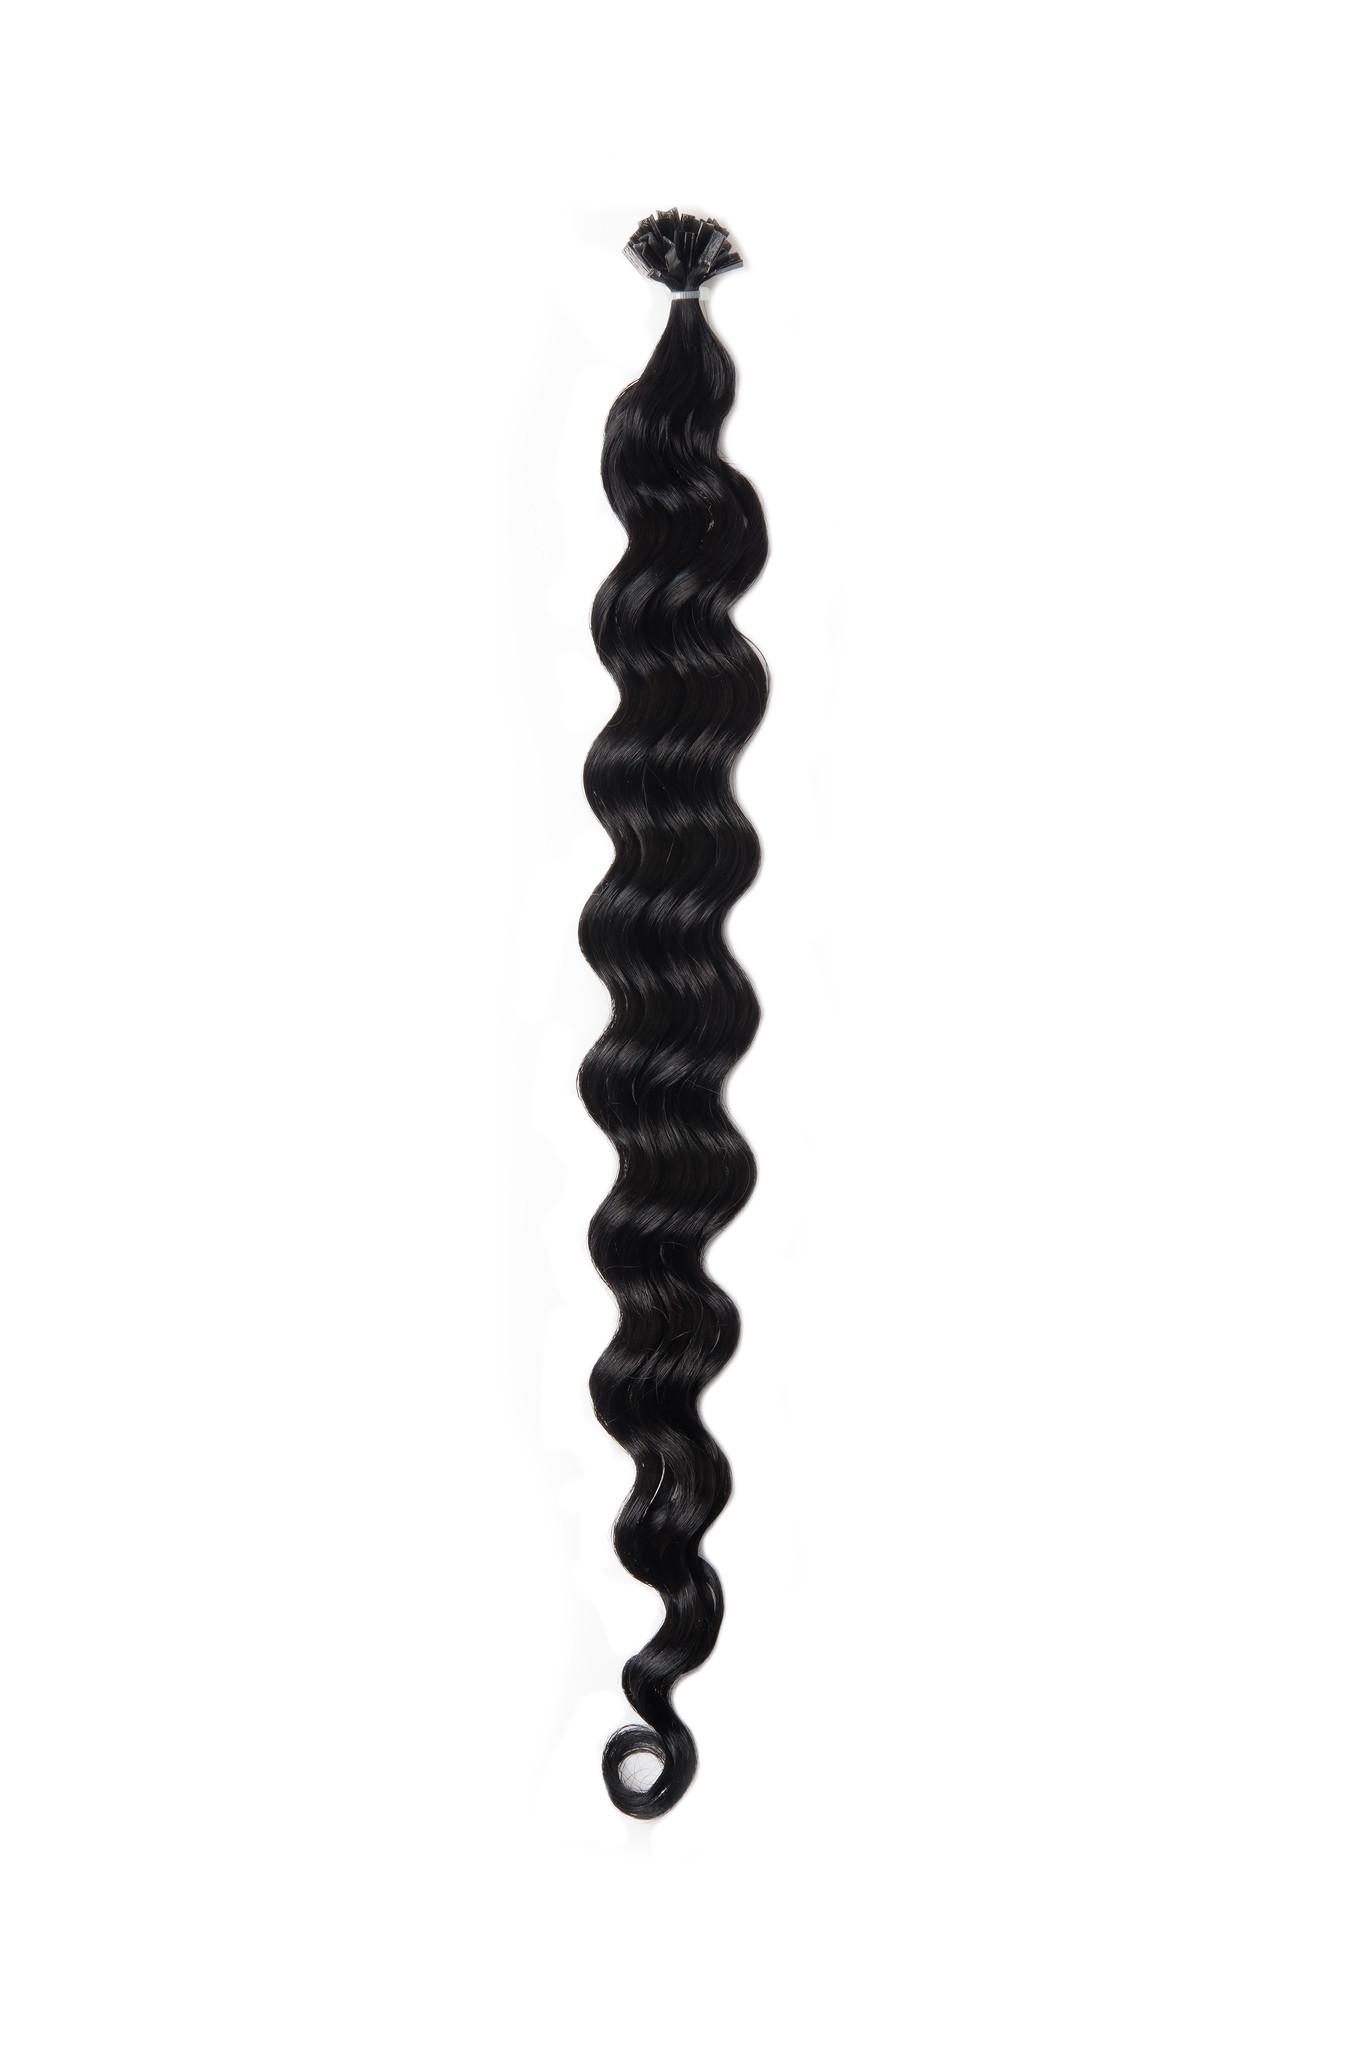 SilverFox Wax Extensions Deep Wave 55cm  #1 Jet Black